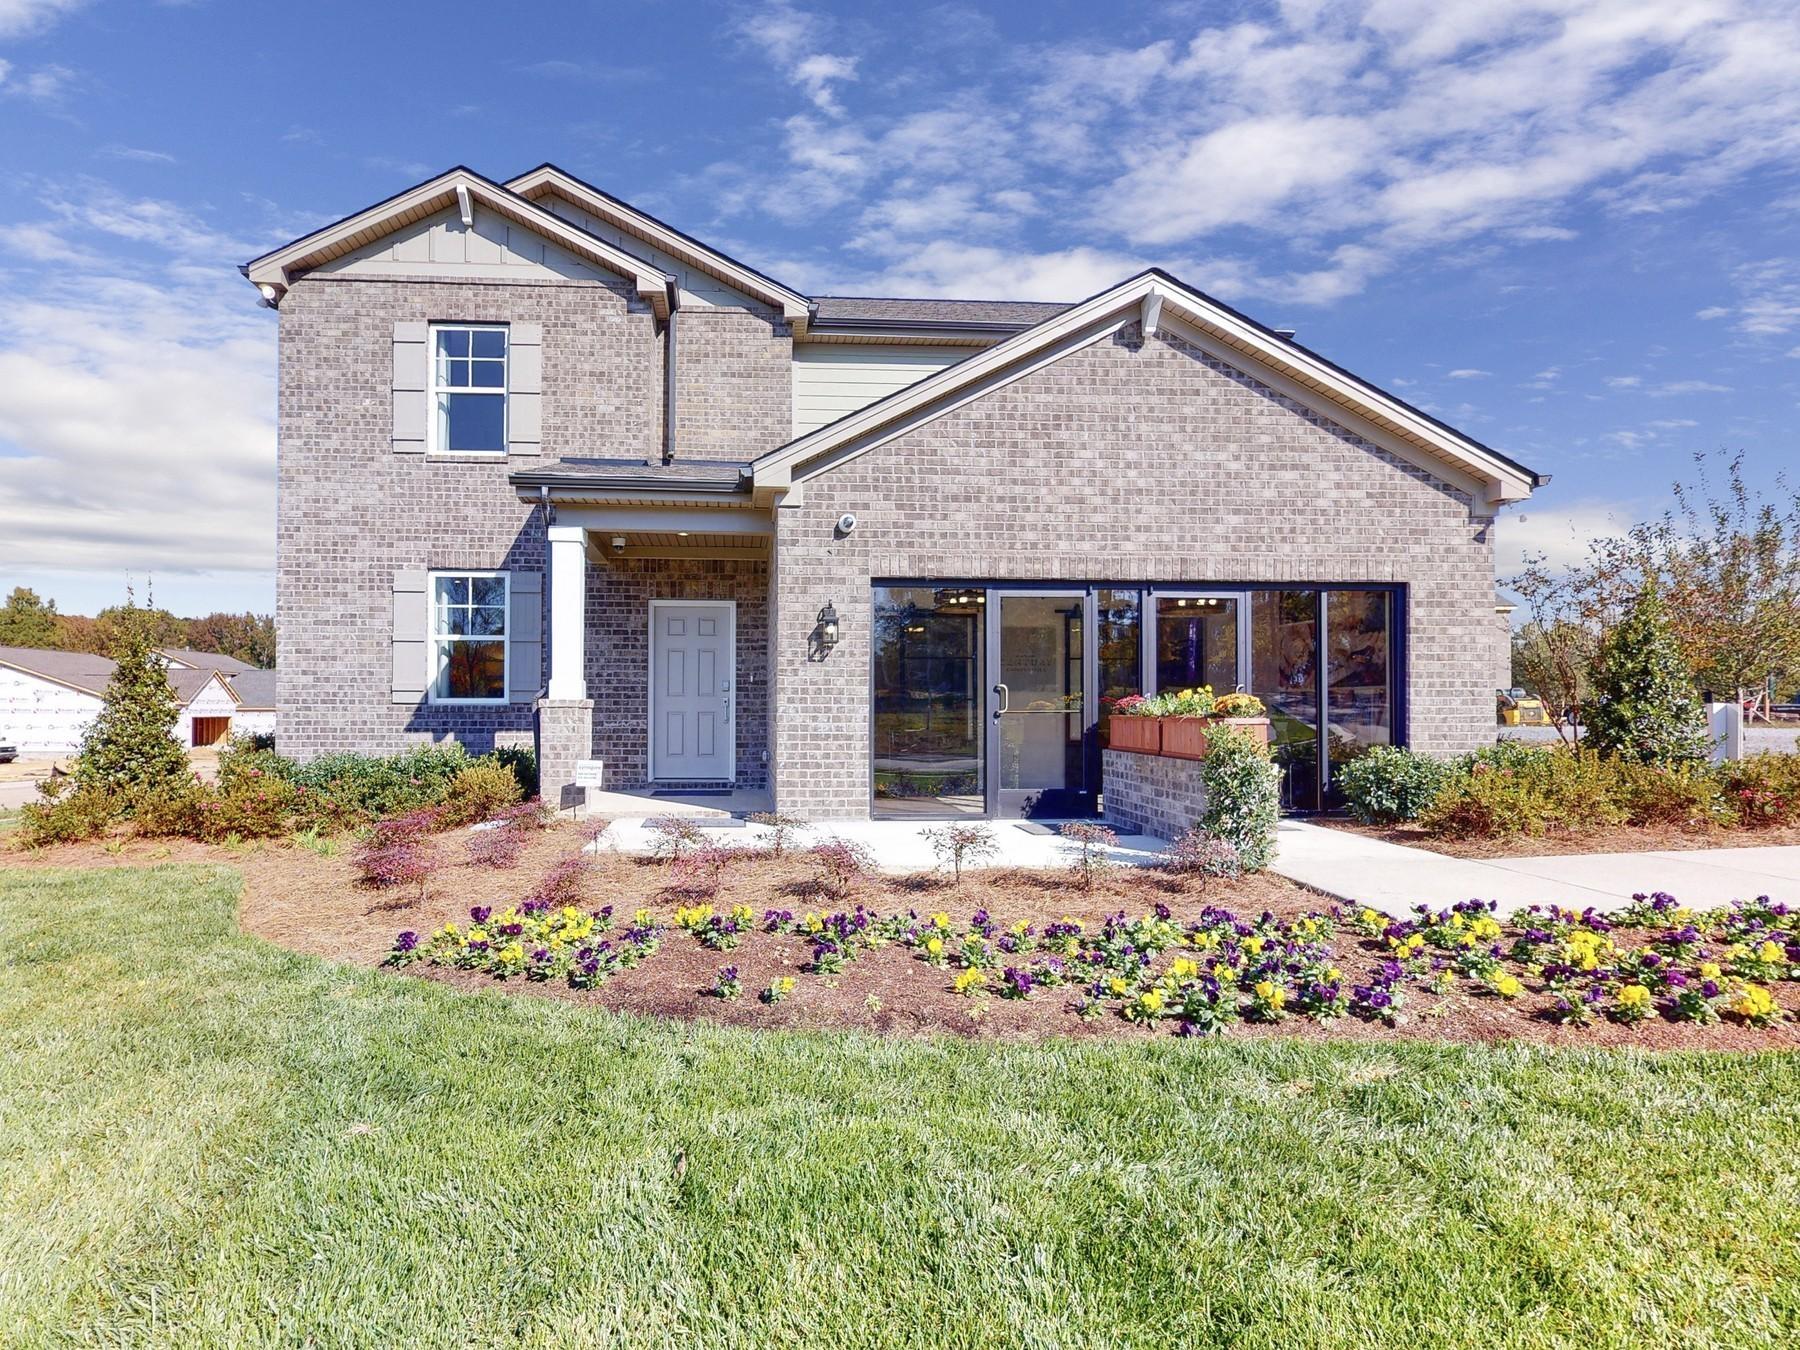 4407 Socata Ct. Property Photo - Cross Plains, TN real estate listing